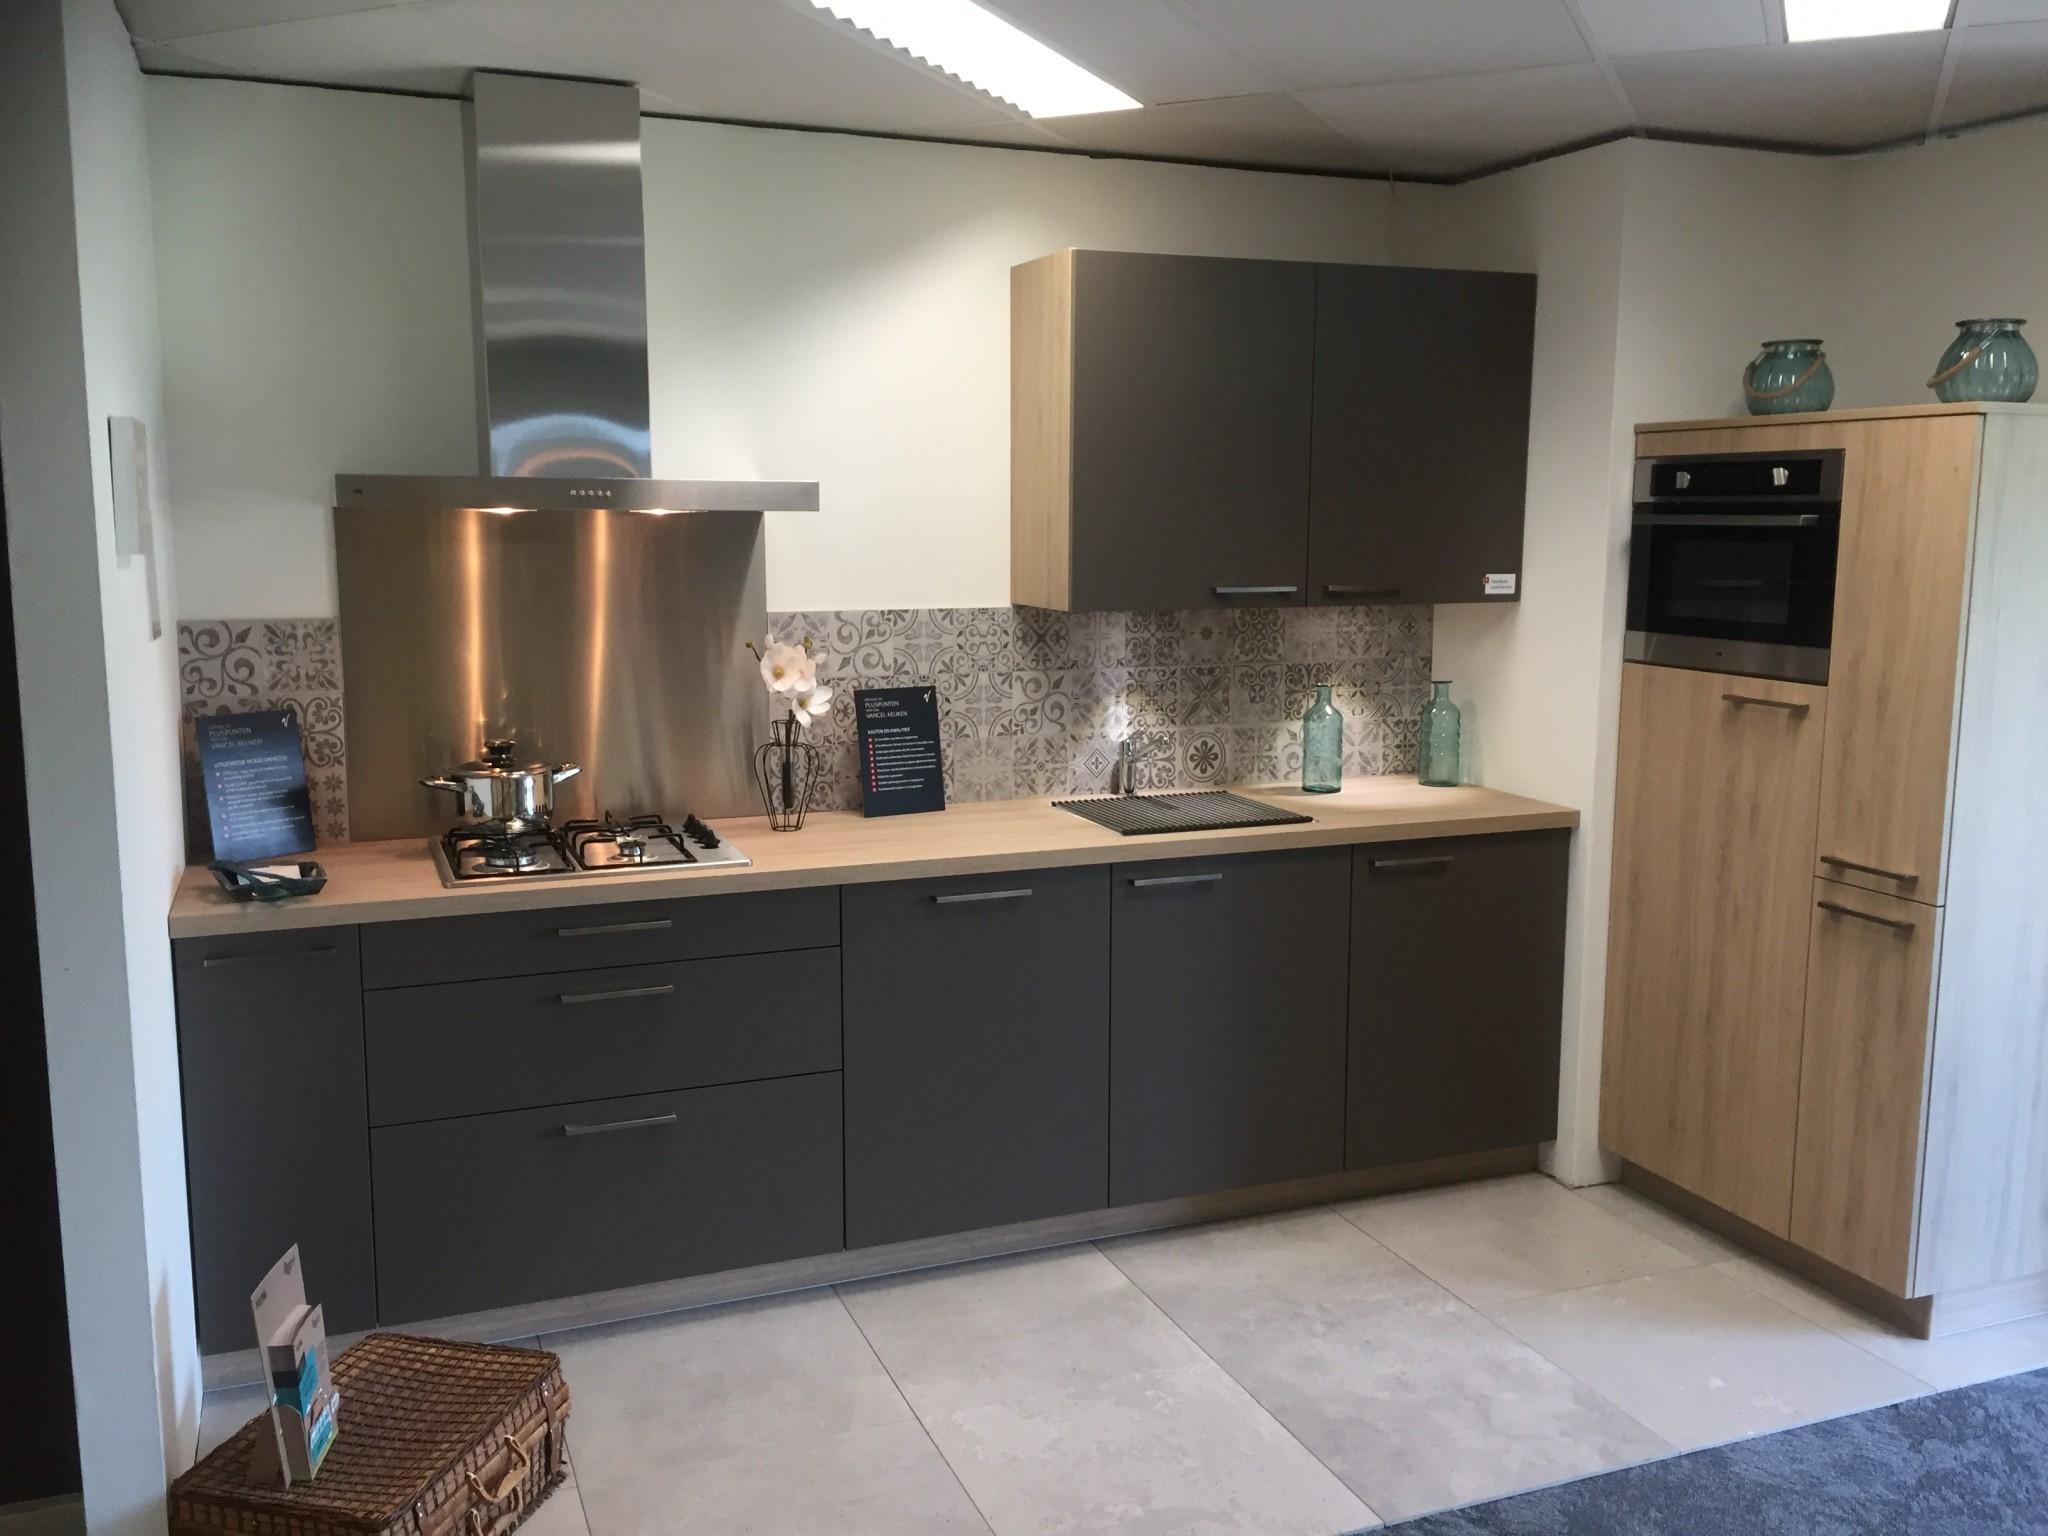 Moderne Nederlandse Keuken : Tijdloze moderne keuken van vancel kremer keukens showroom